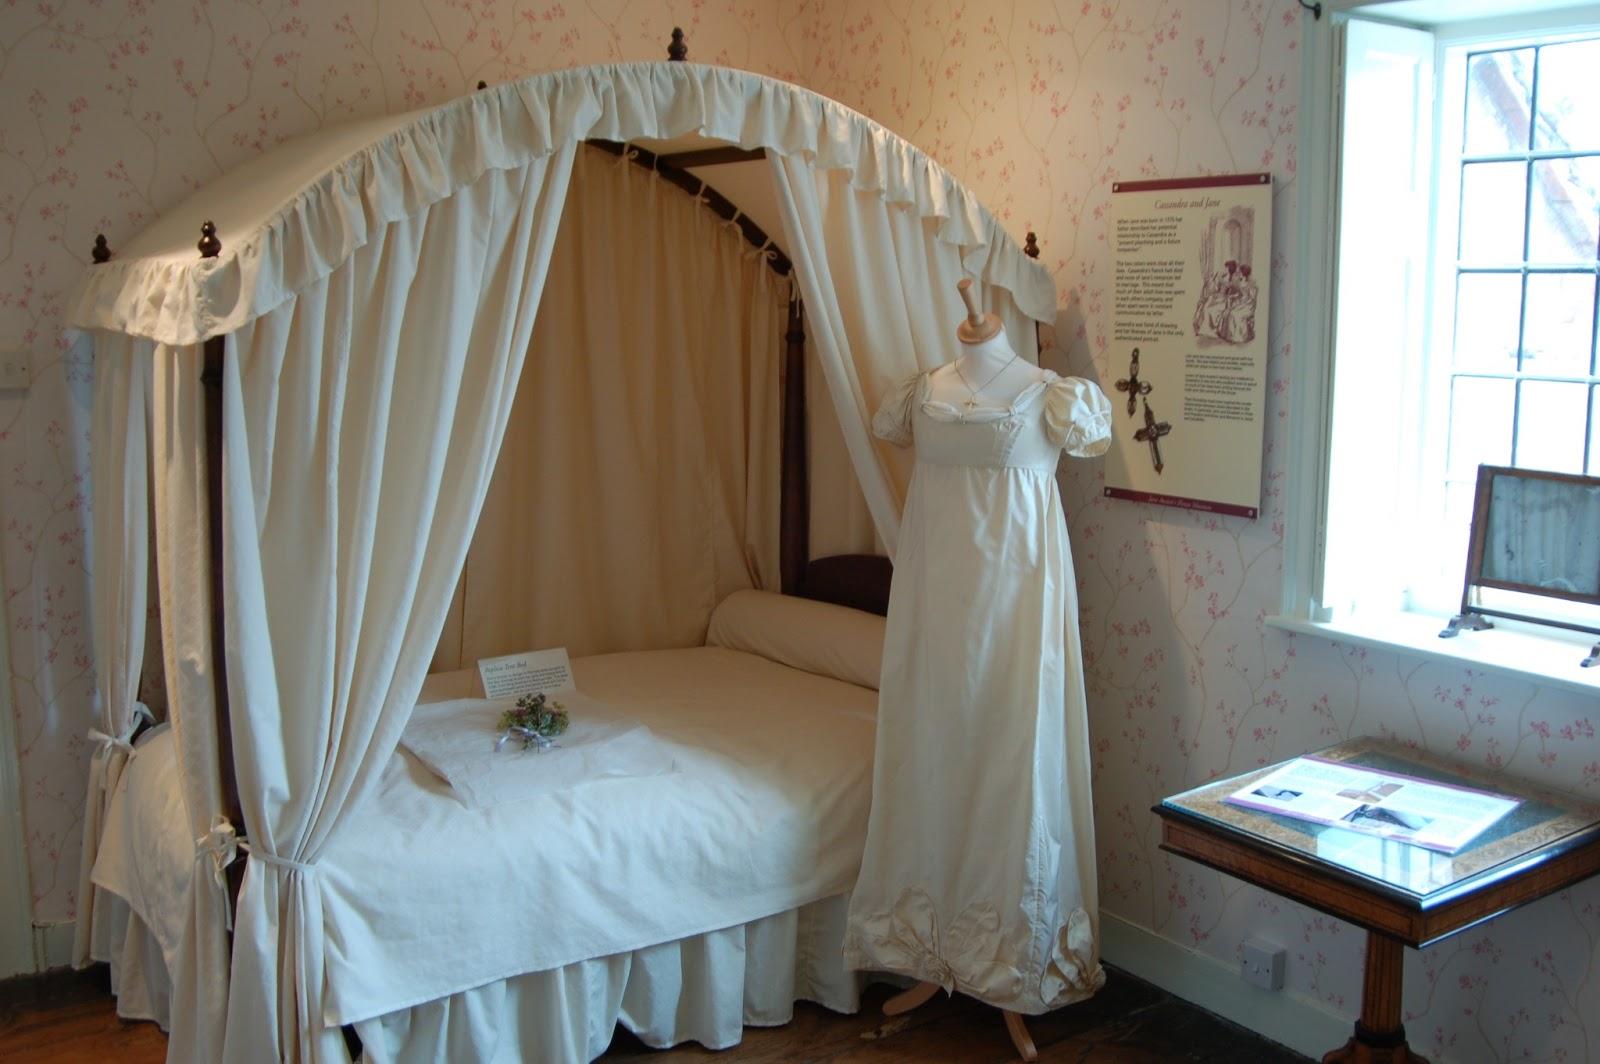 Baugh S Blog Photo Essay Jane Austen S House Museum In